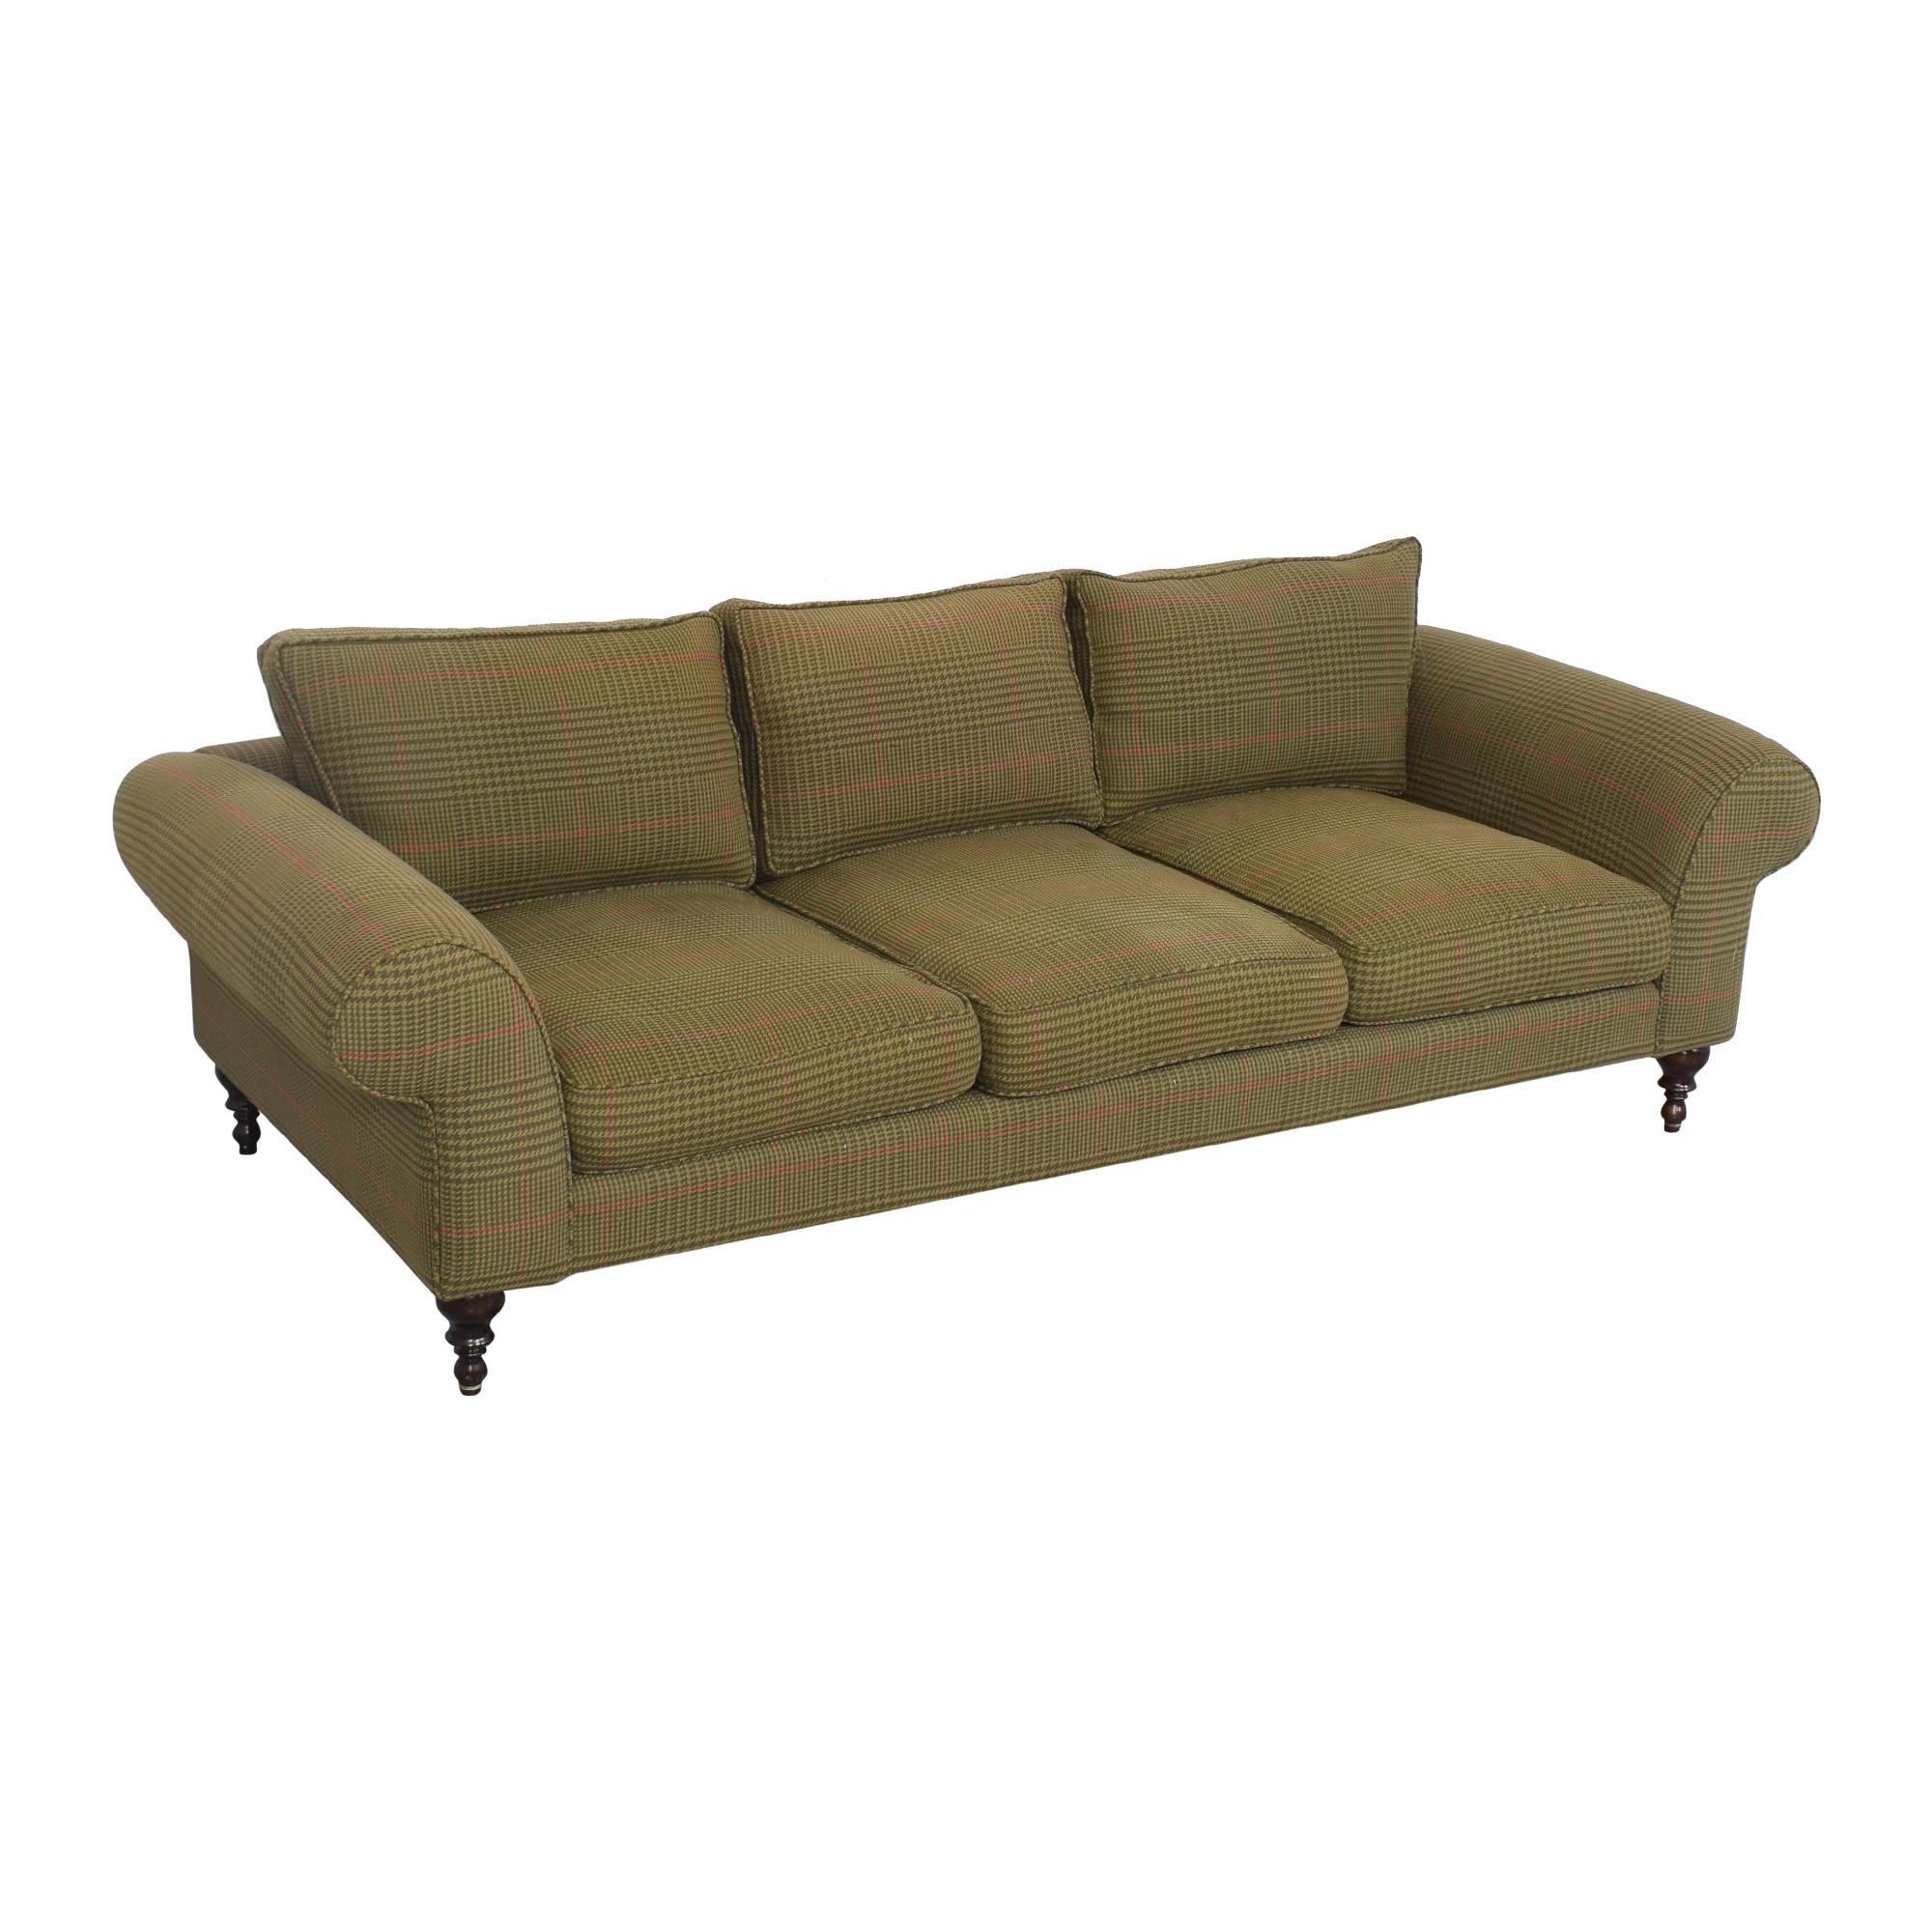 Roll Arm Three Seat Sofa pa